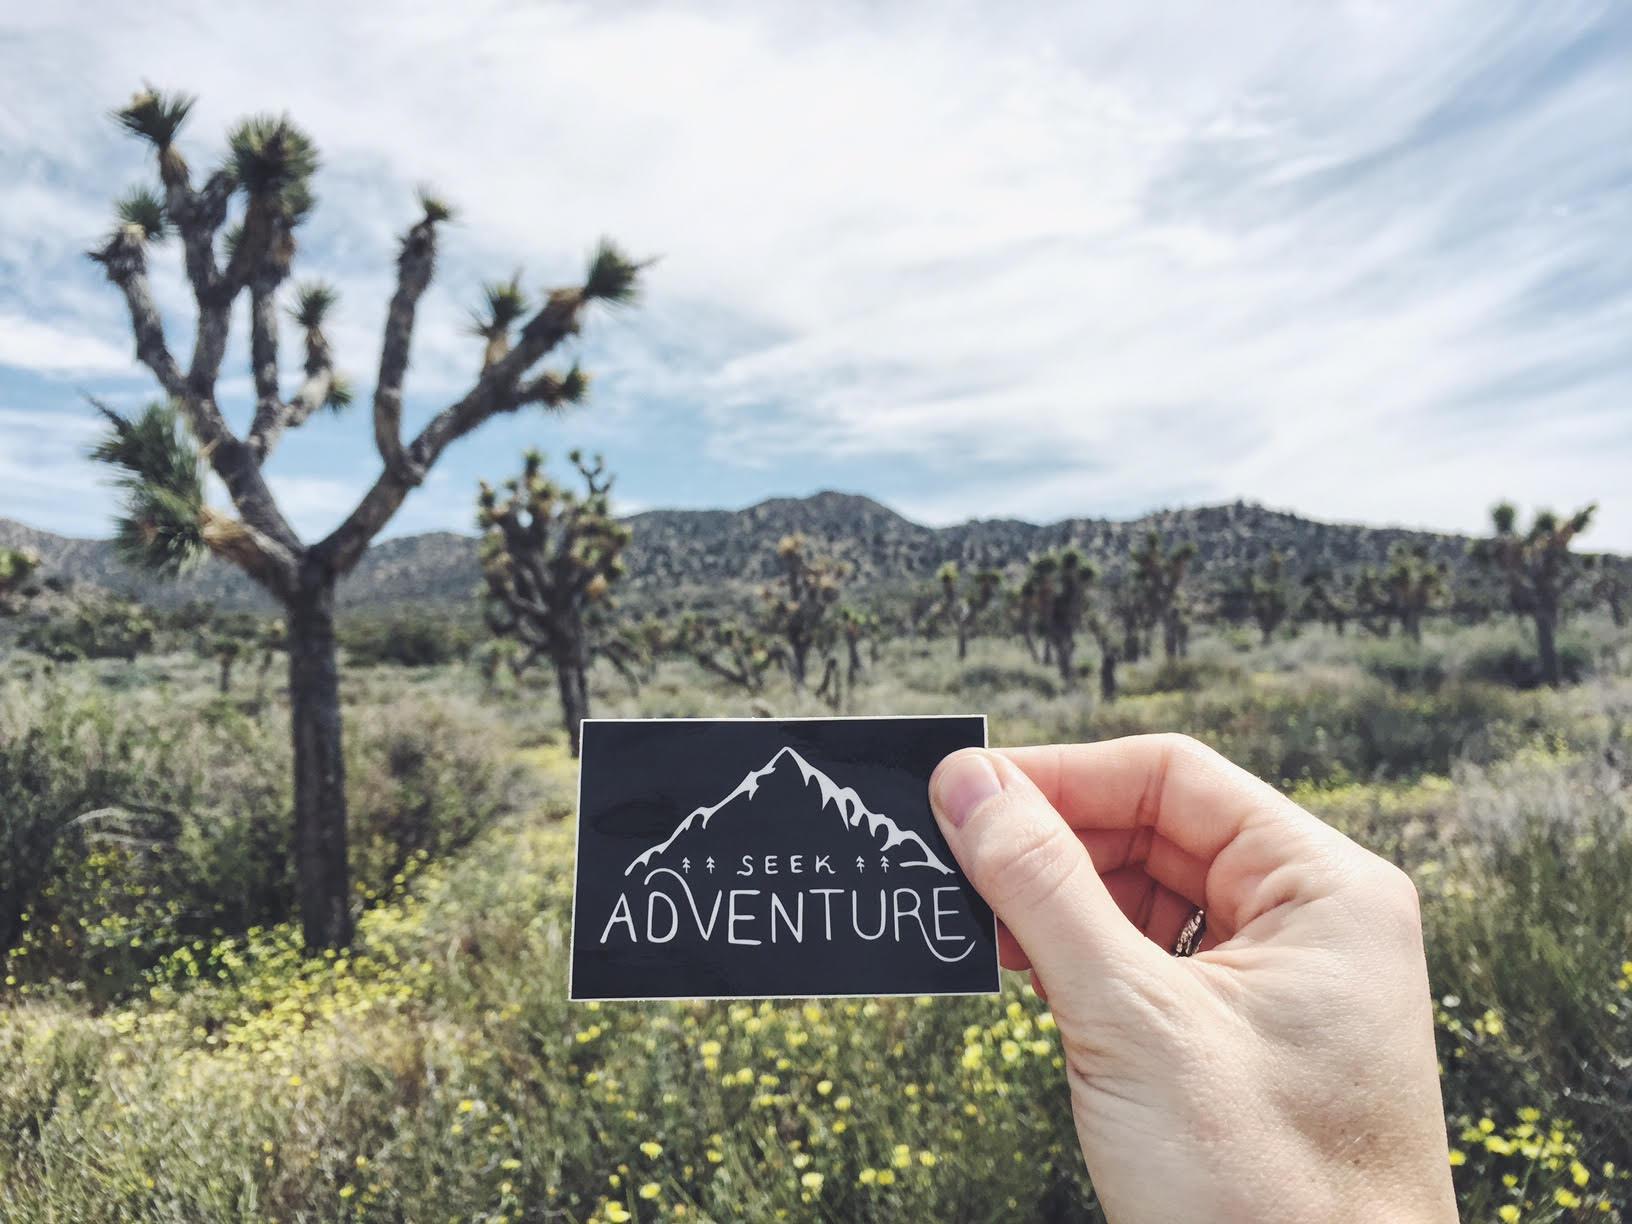 Seek Adventure in Joshua Tree National Park - the Badon Hill Blog